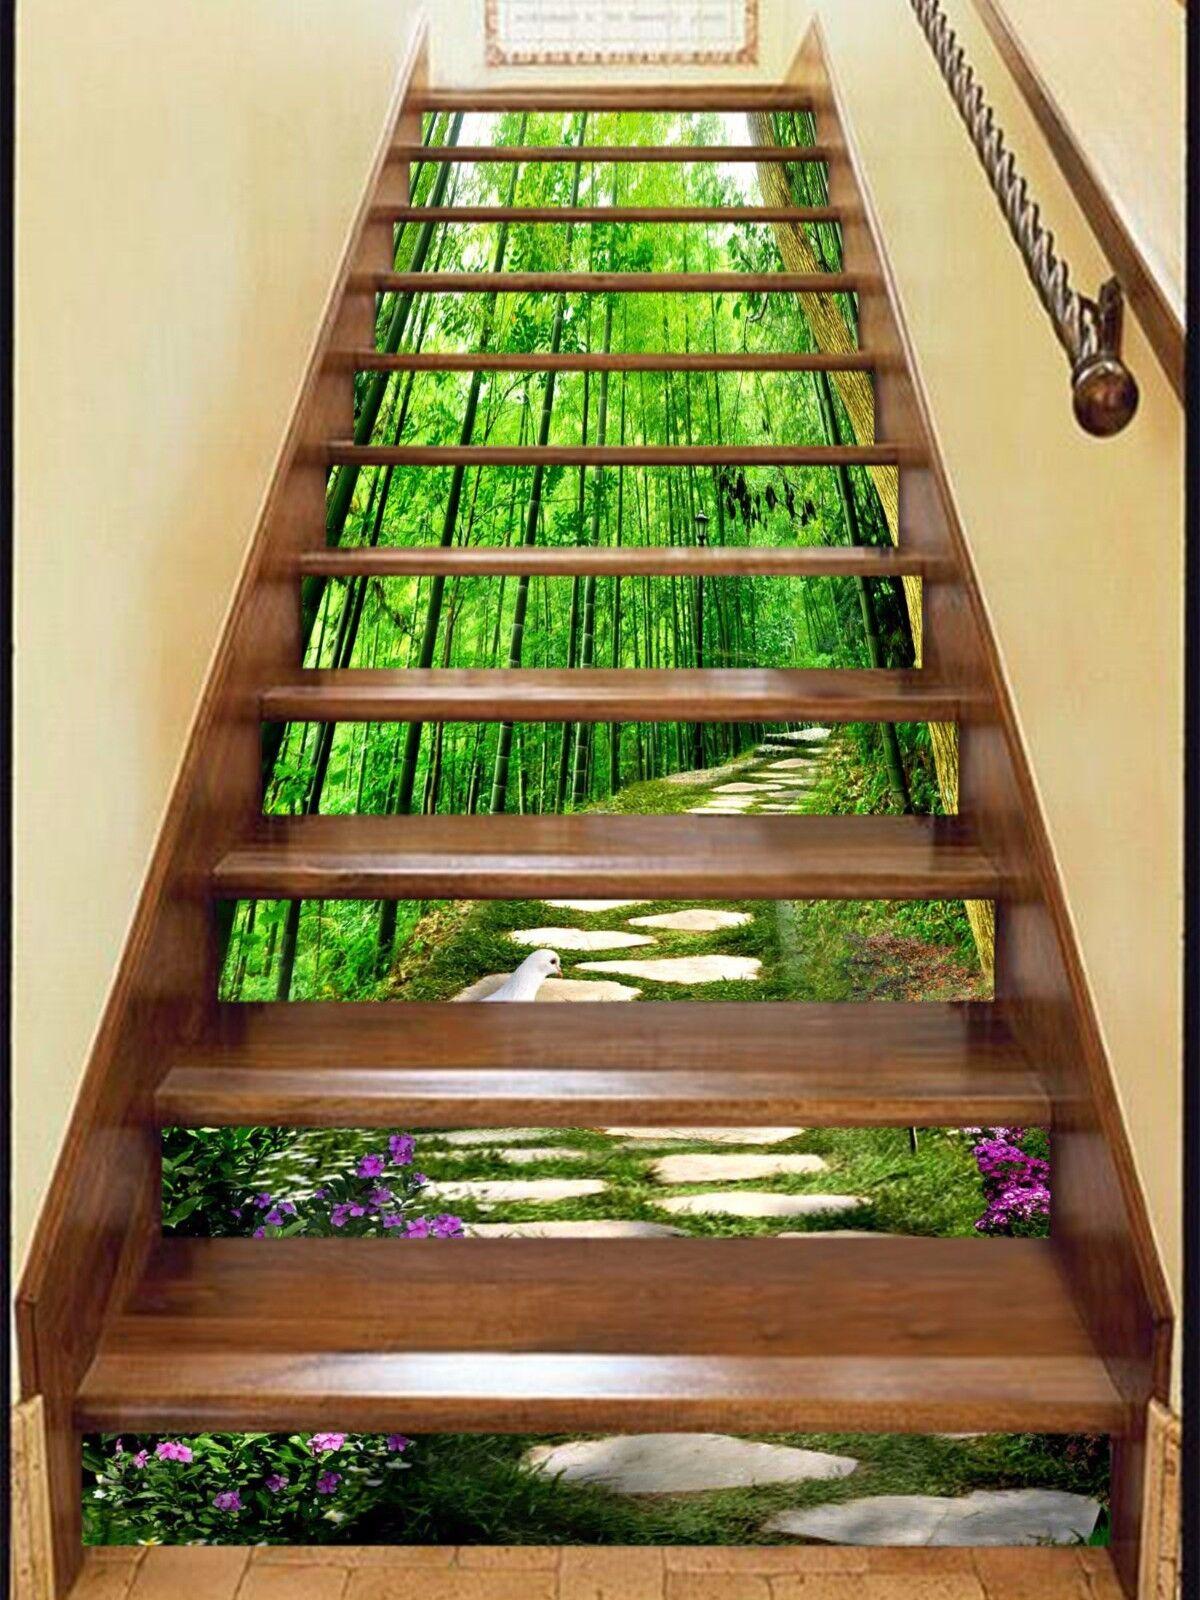 3D Bamboos Road 520 Stair Risers Decoration Photo Mural Vinyl Decal WandPapier UK